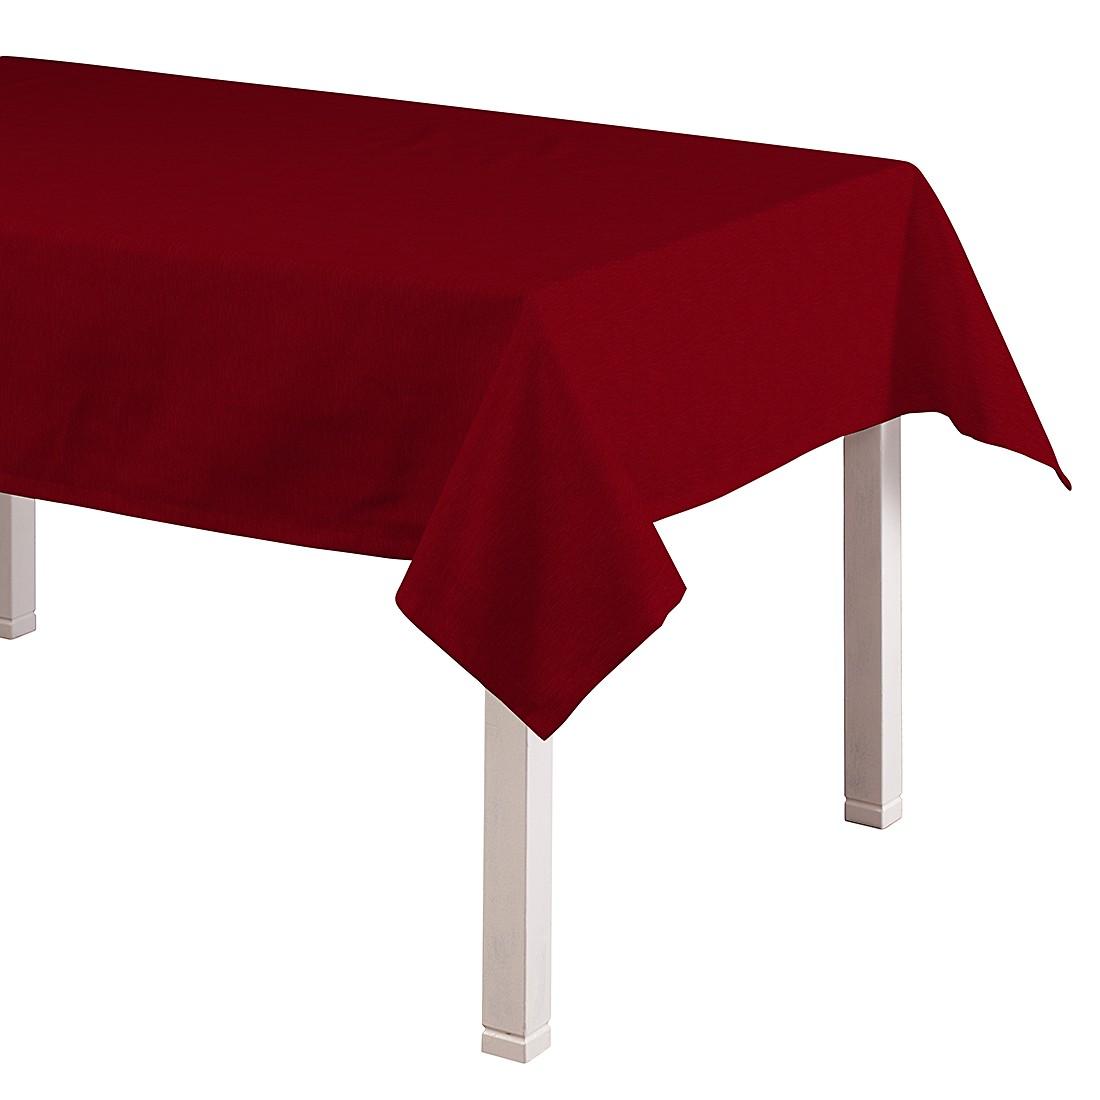 Tischdecke Atago – Bordeaux – 130 x 210 cm, Dekoria günstig bestellen